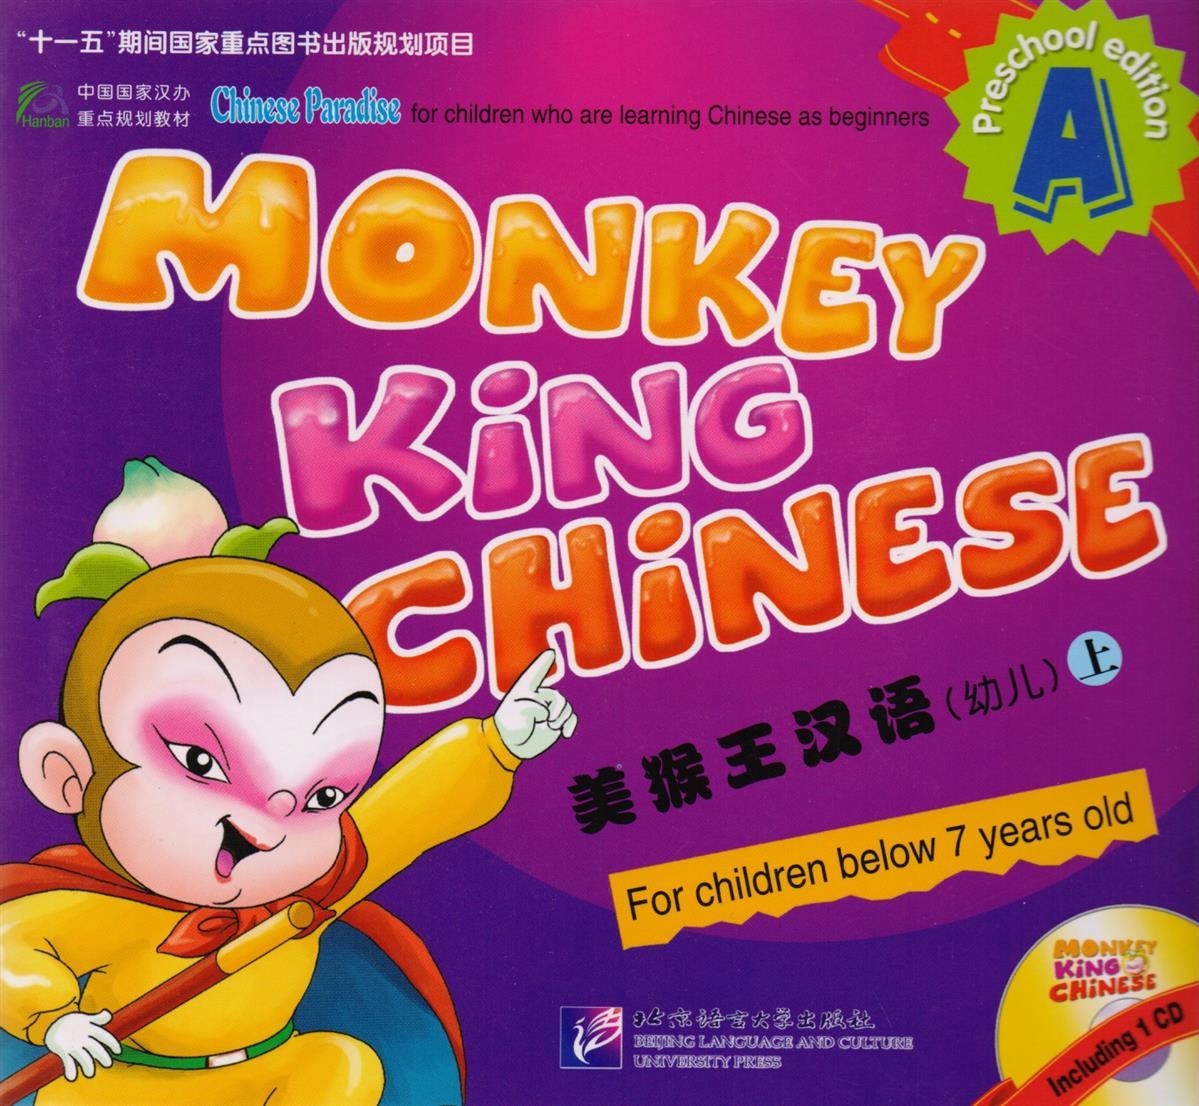 Liu Fuhua, Wang Wei, Zhou Ruia Monkey King Chinese. Part A / Учим китайский с королем обезьян для дошкольников. Часть A (+CD) (книга на китайском и английском языках) collins essential chinese dictionary